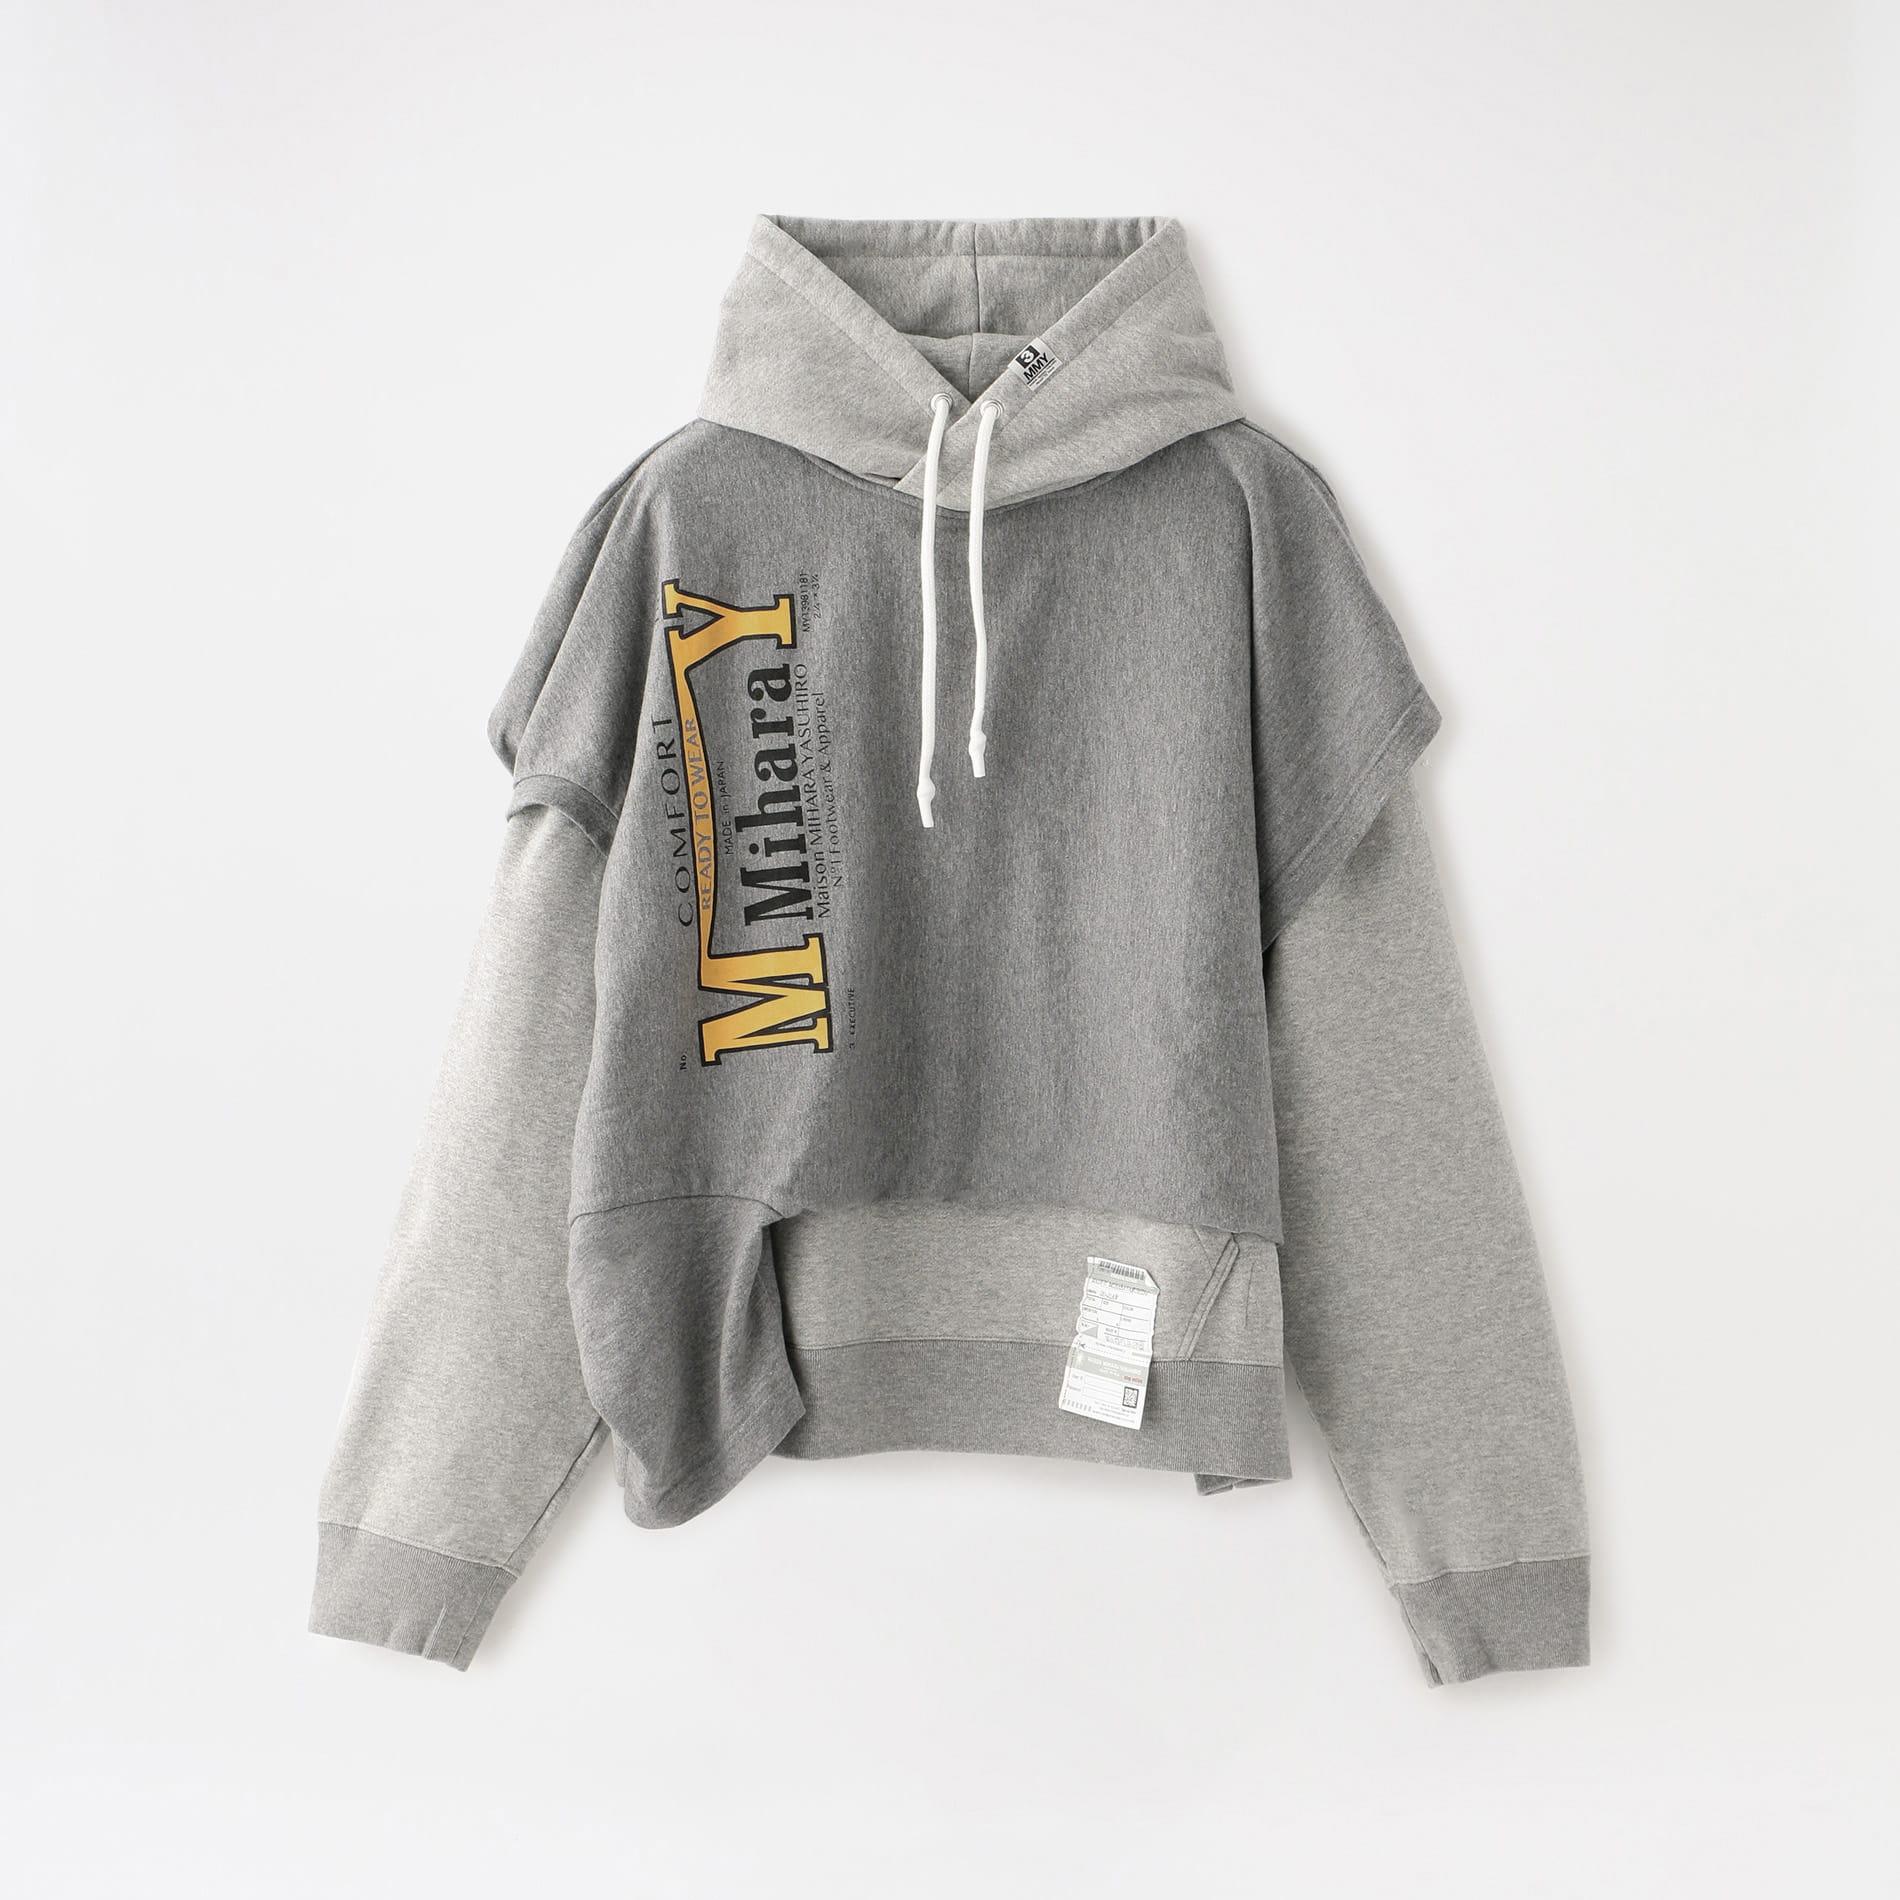 【Maison MIHARA YASUHIRO】MEN T-shirt docking hoodie A05HD551